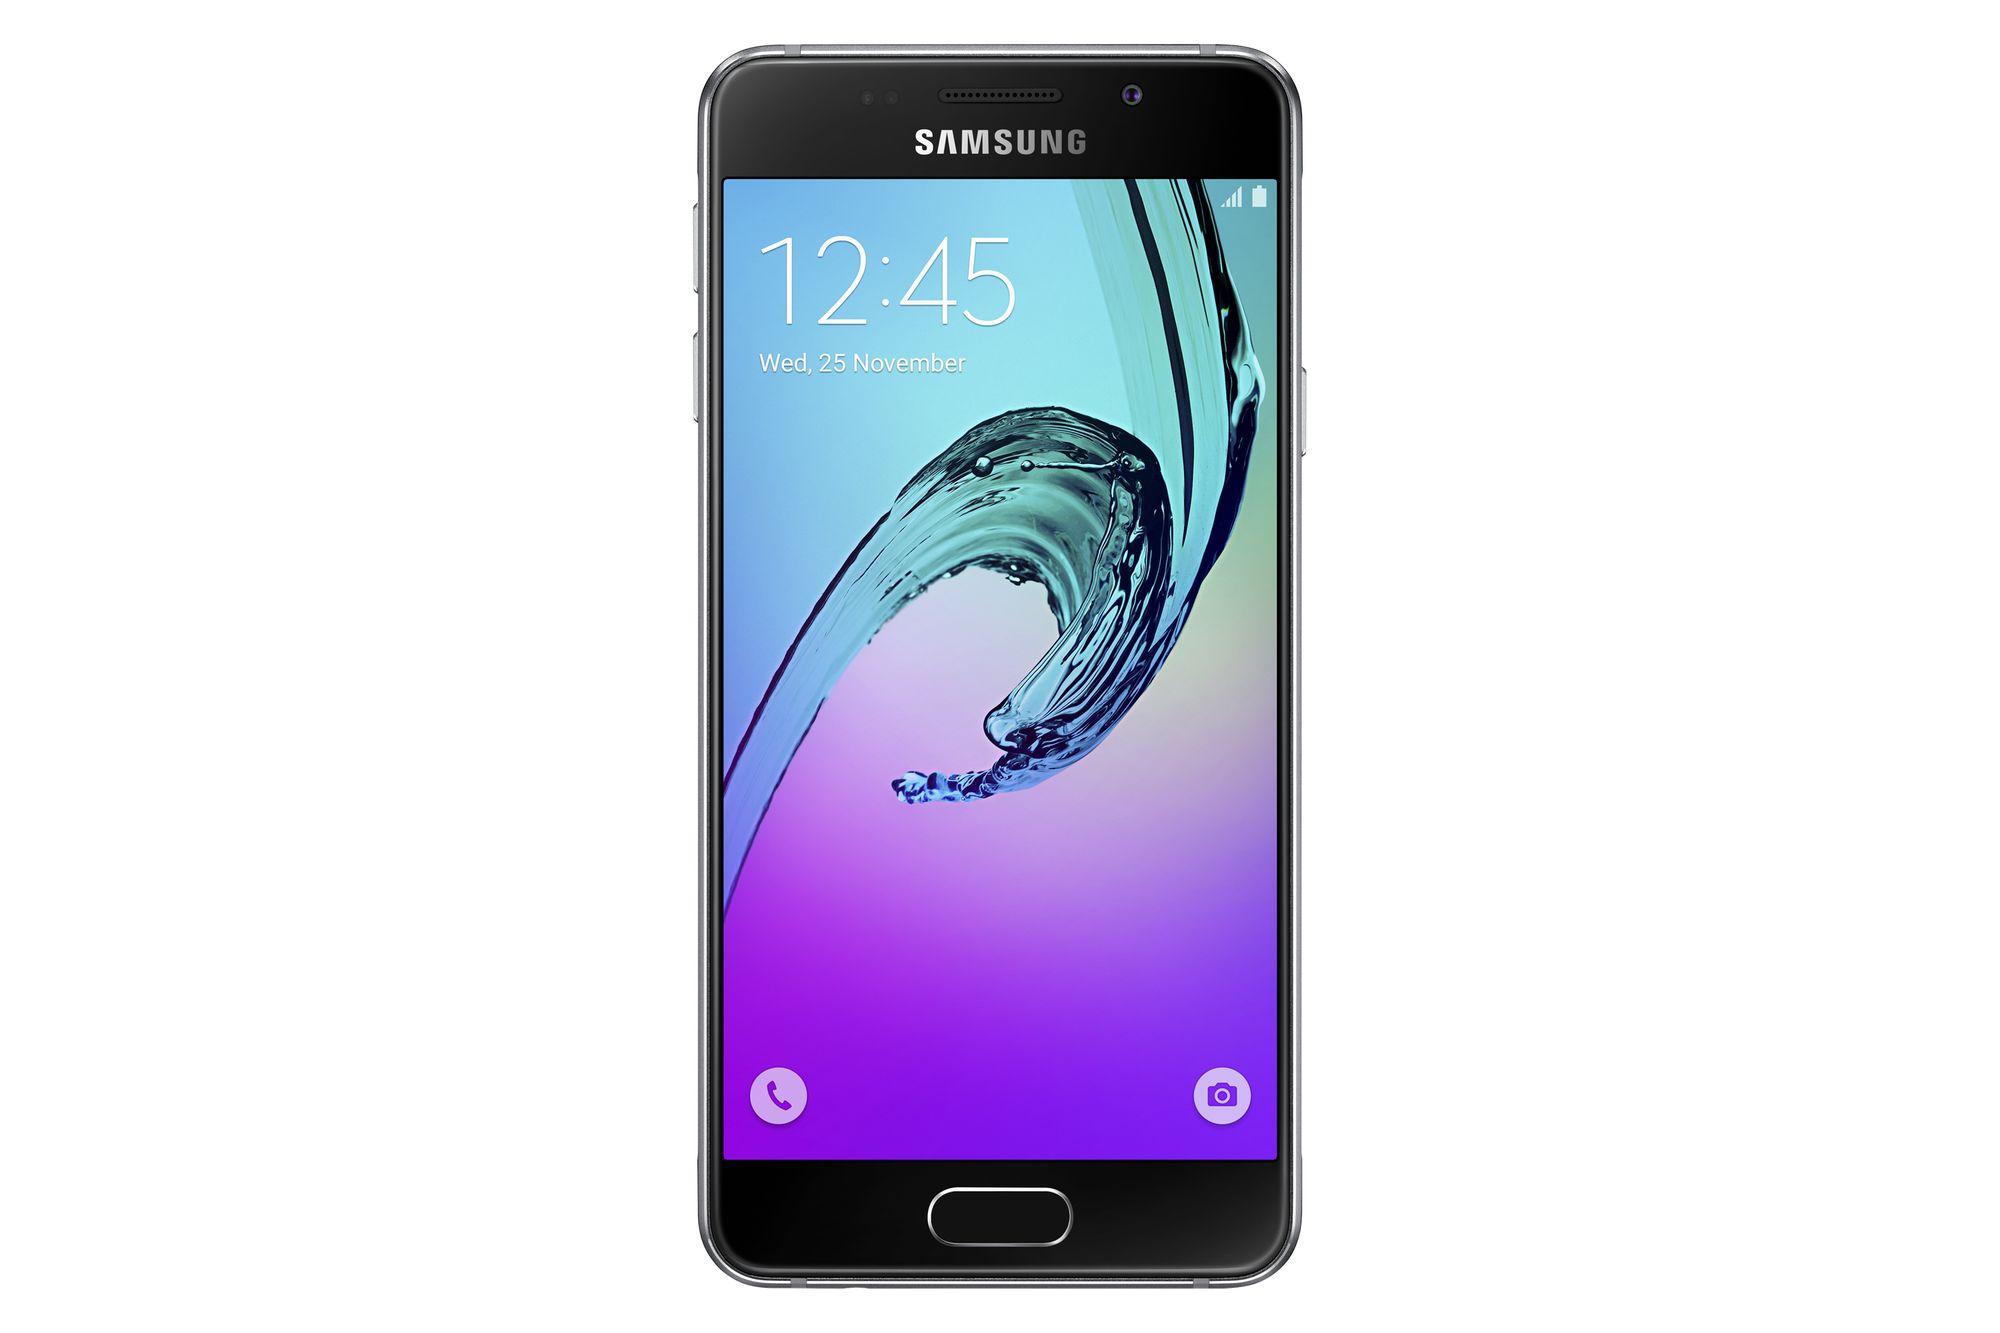 🔥 Bon plan : Samsung Galaxy A3 (2016) à 209 euros sur Amazon